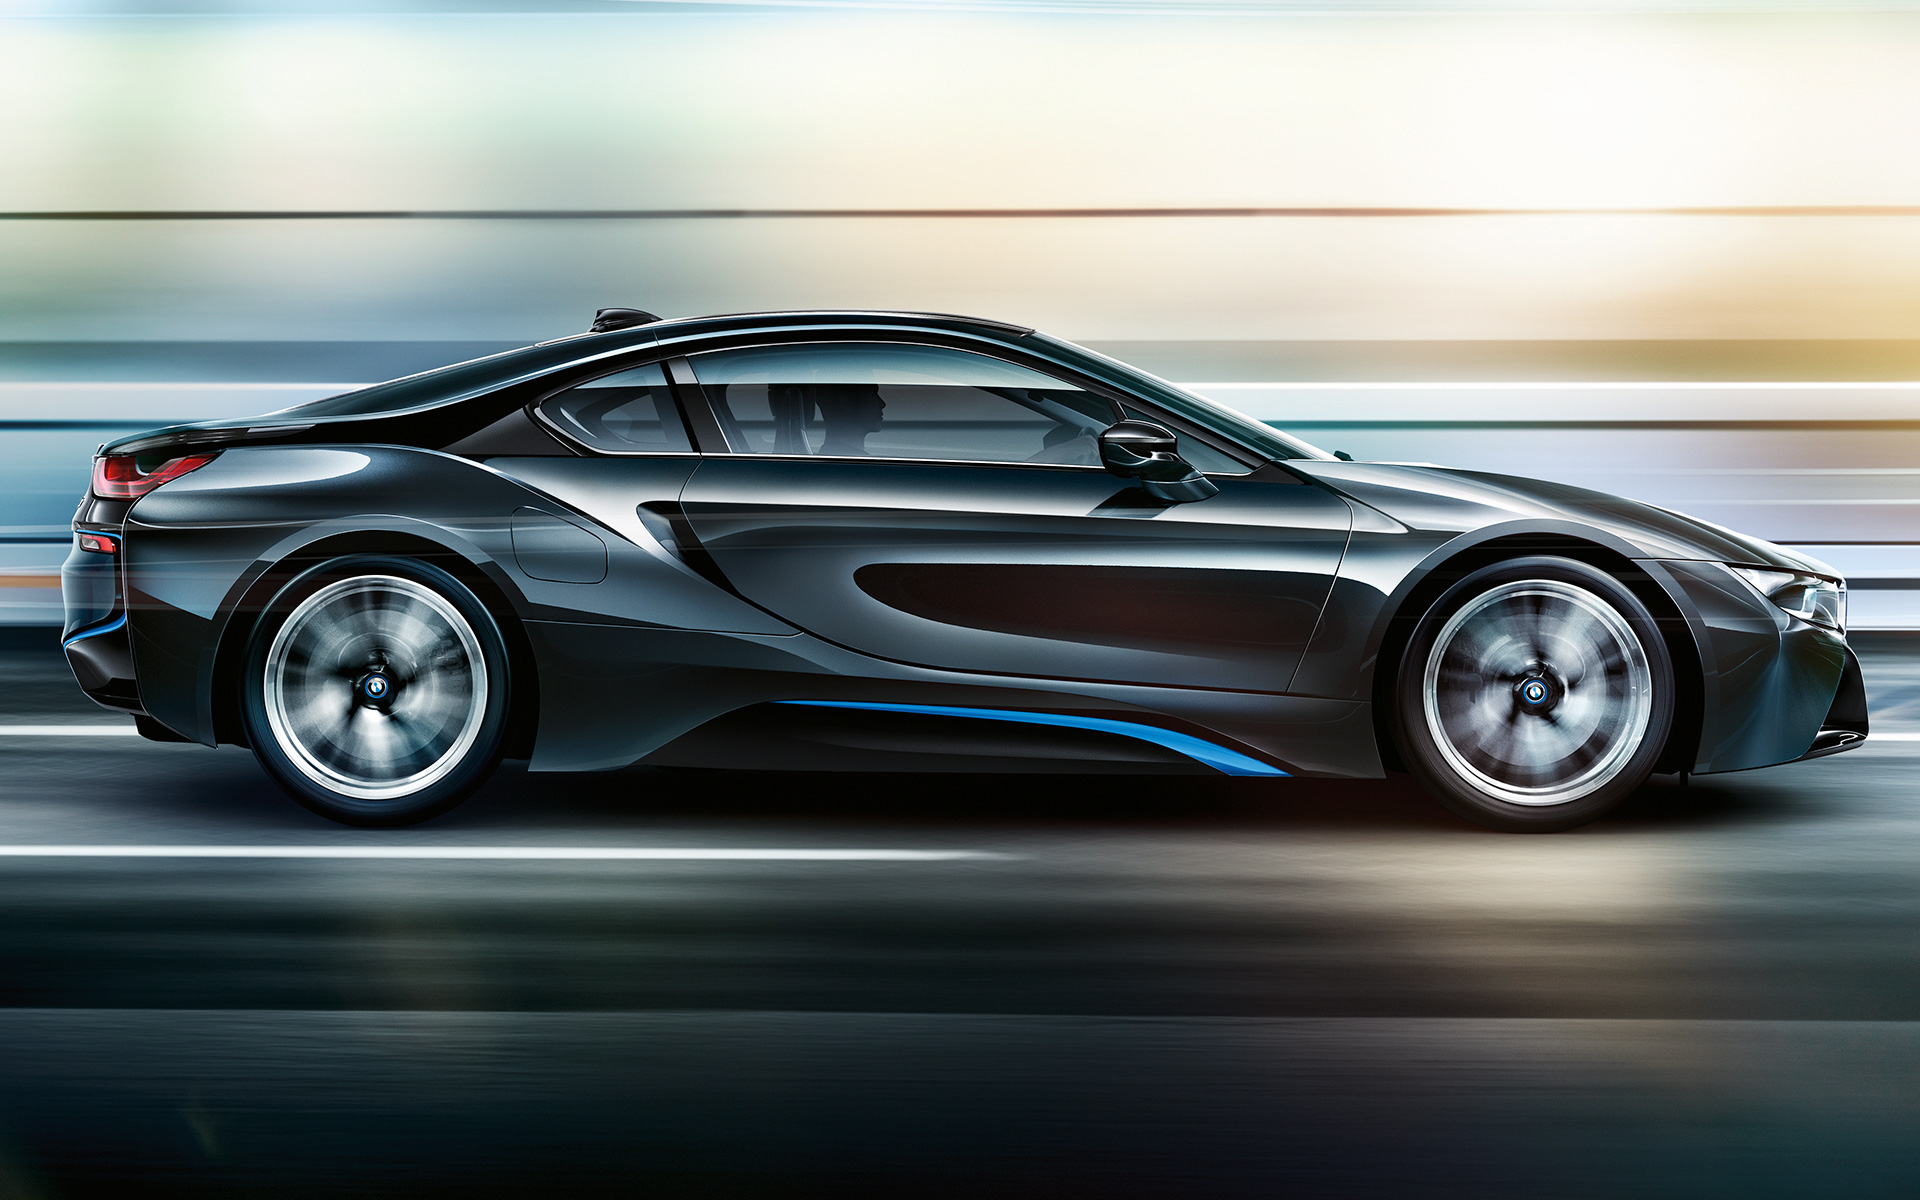 BMW i8 Protonic Frozen Black wallpaper06